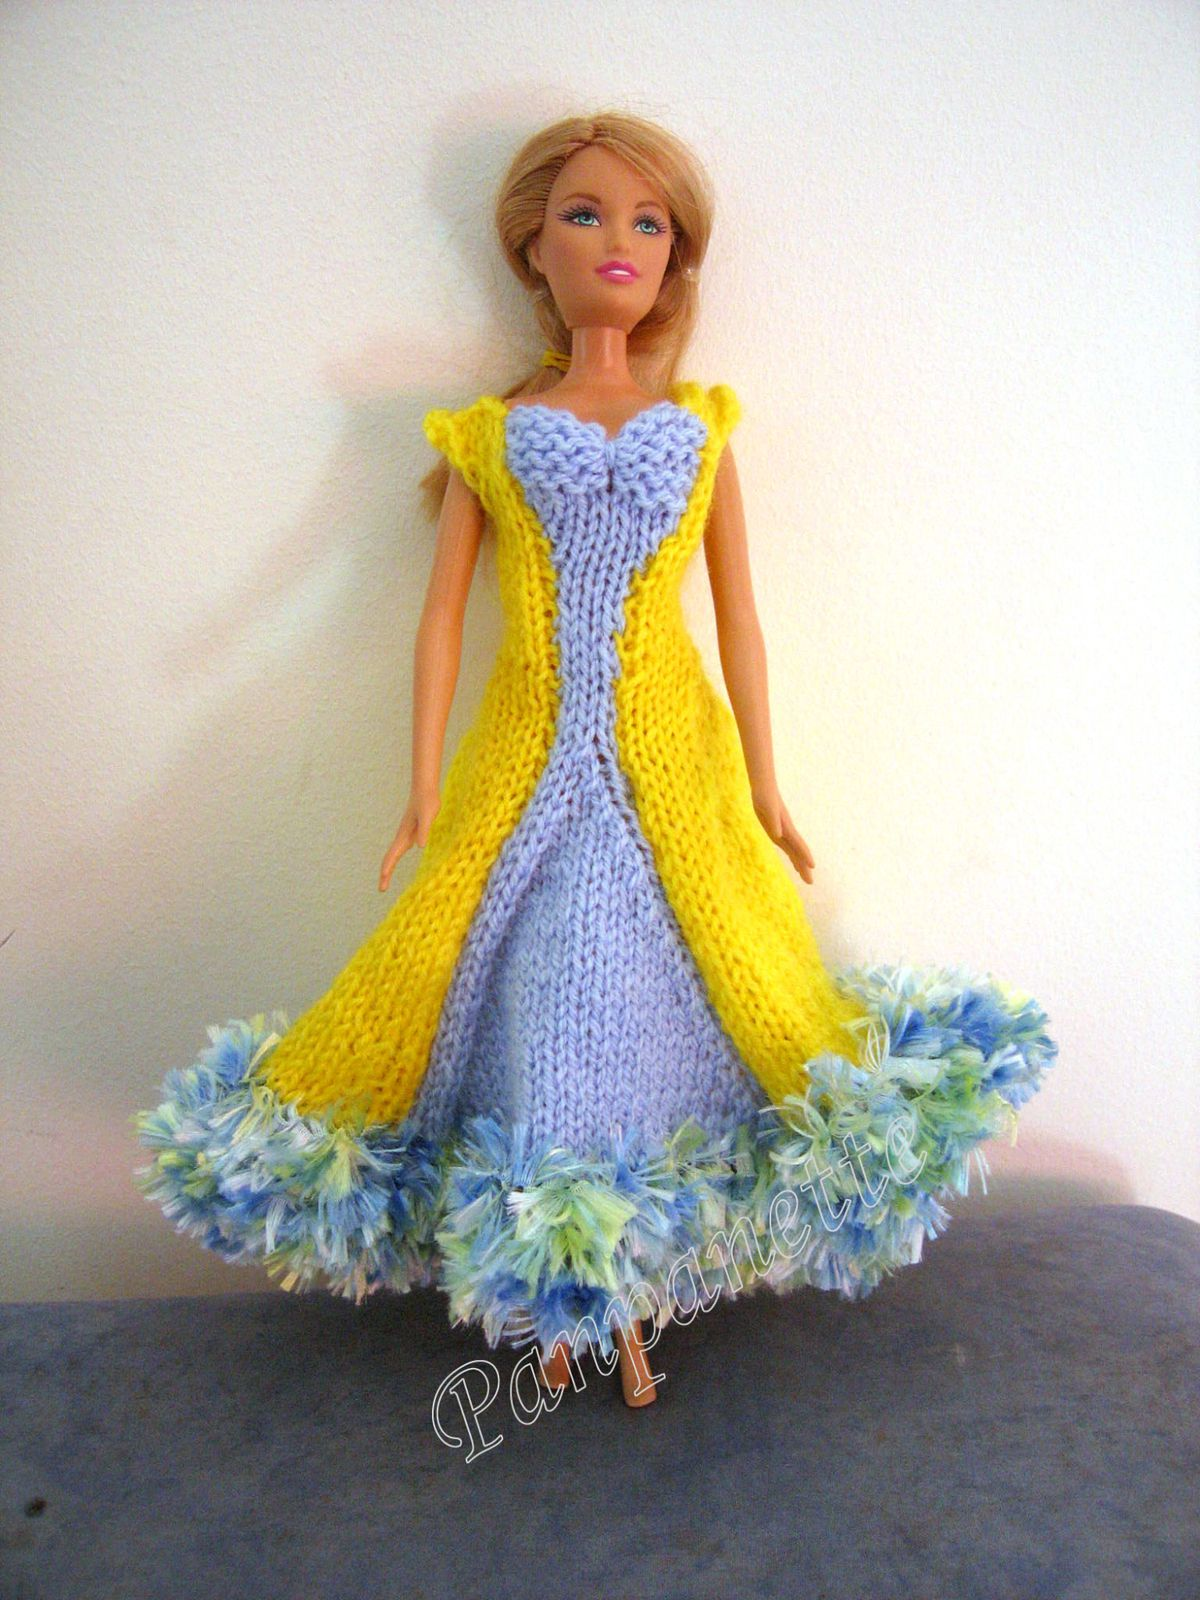 Robe de princesse pour barbie panpanette - Desanime de barbie princesse ...